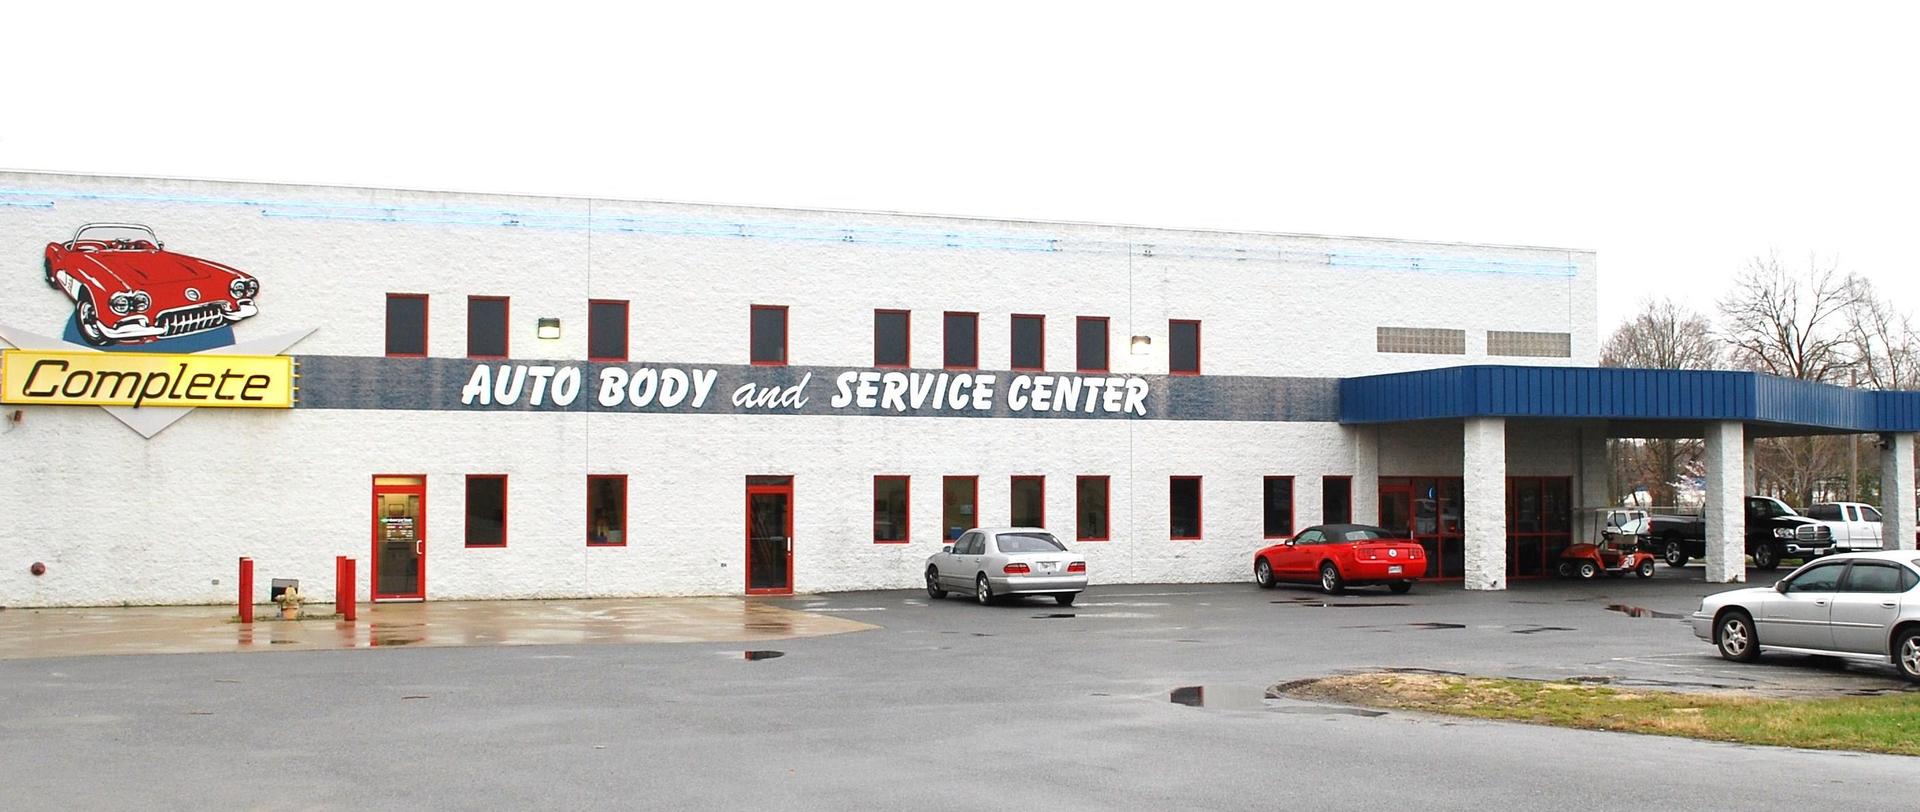 Complete Auto Body and Service Center